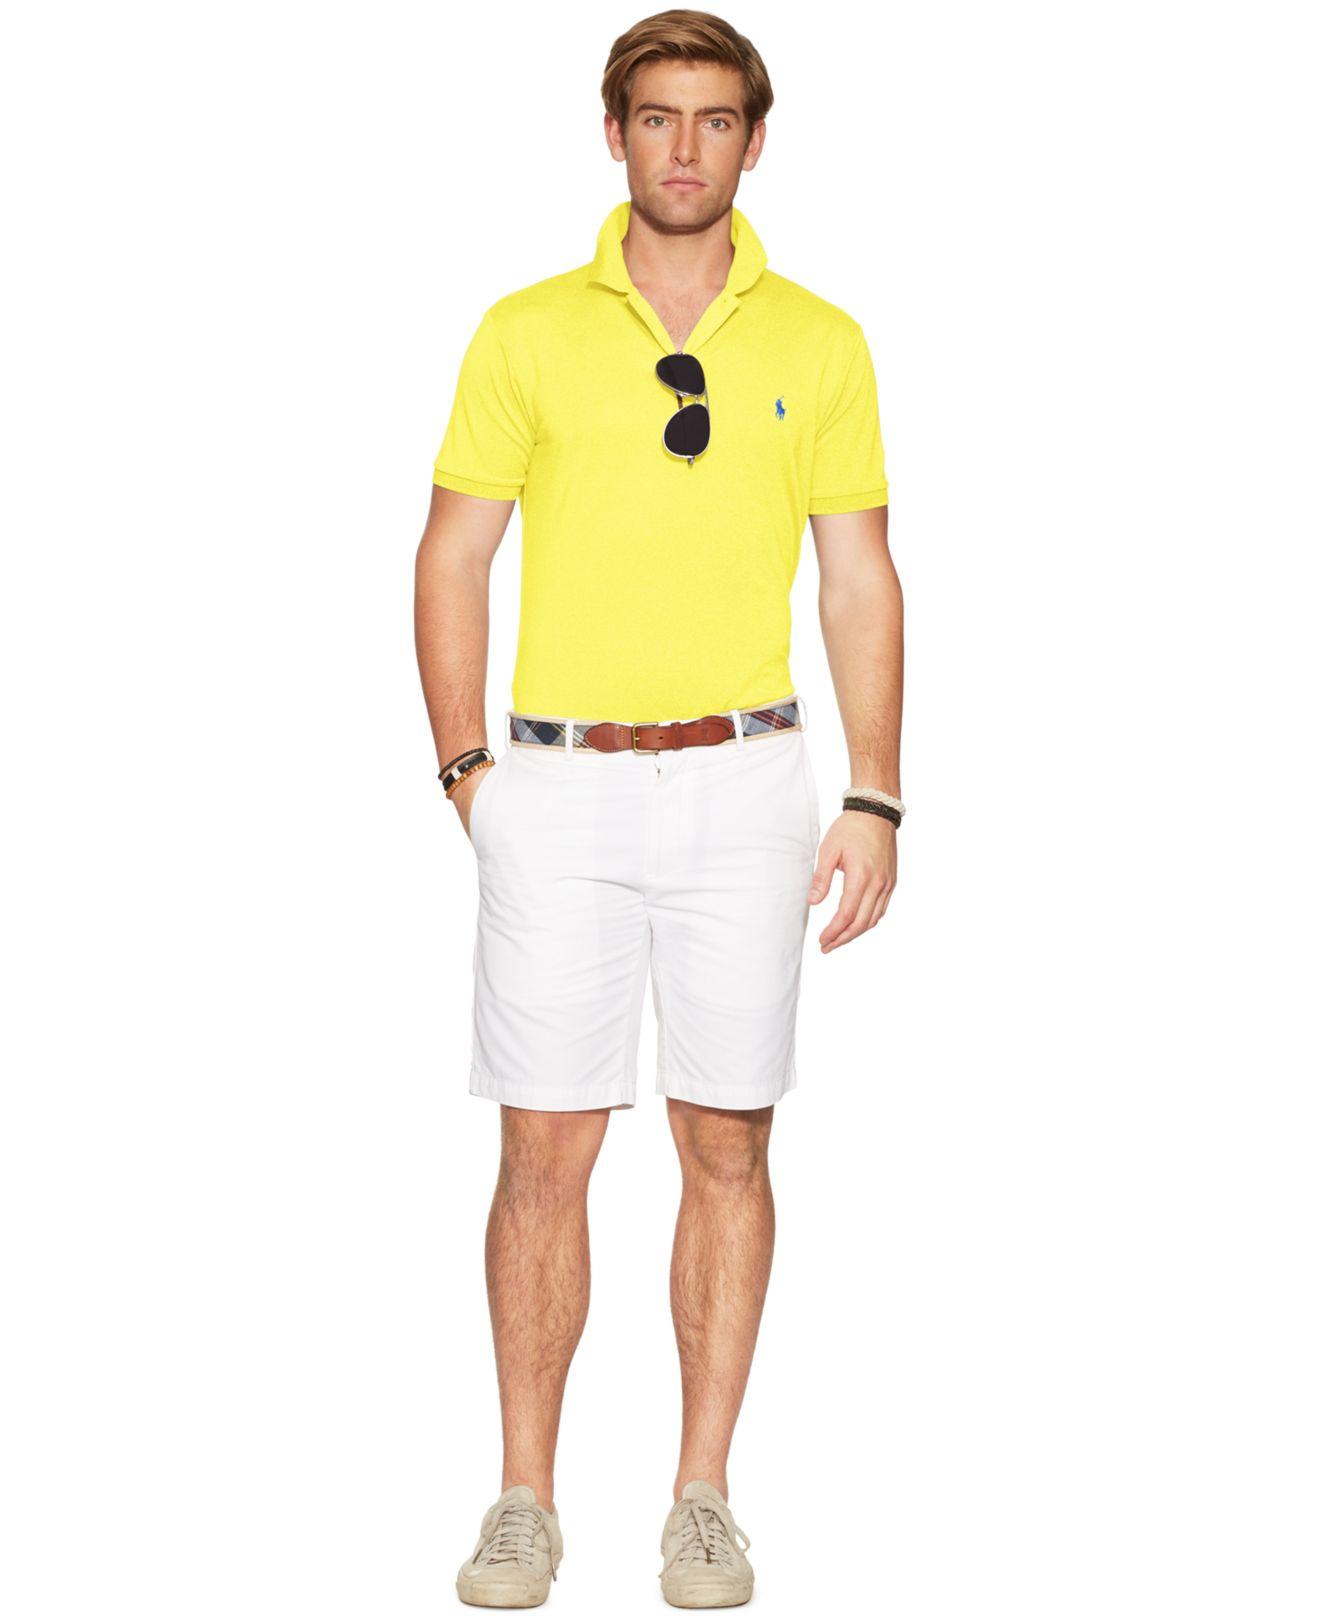 8bdb6e4f8972d ... reduced lyst polo ralph lauren performance mesh polo shirt in yellow  for men f27bb c97f8 ...